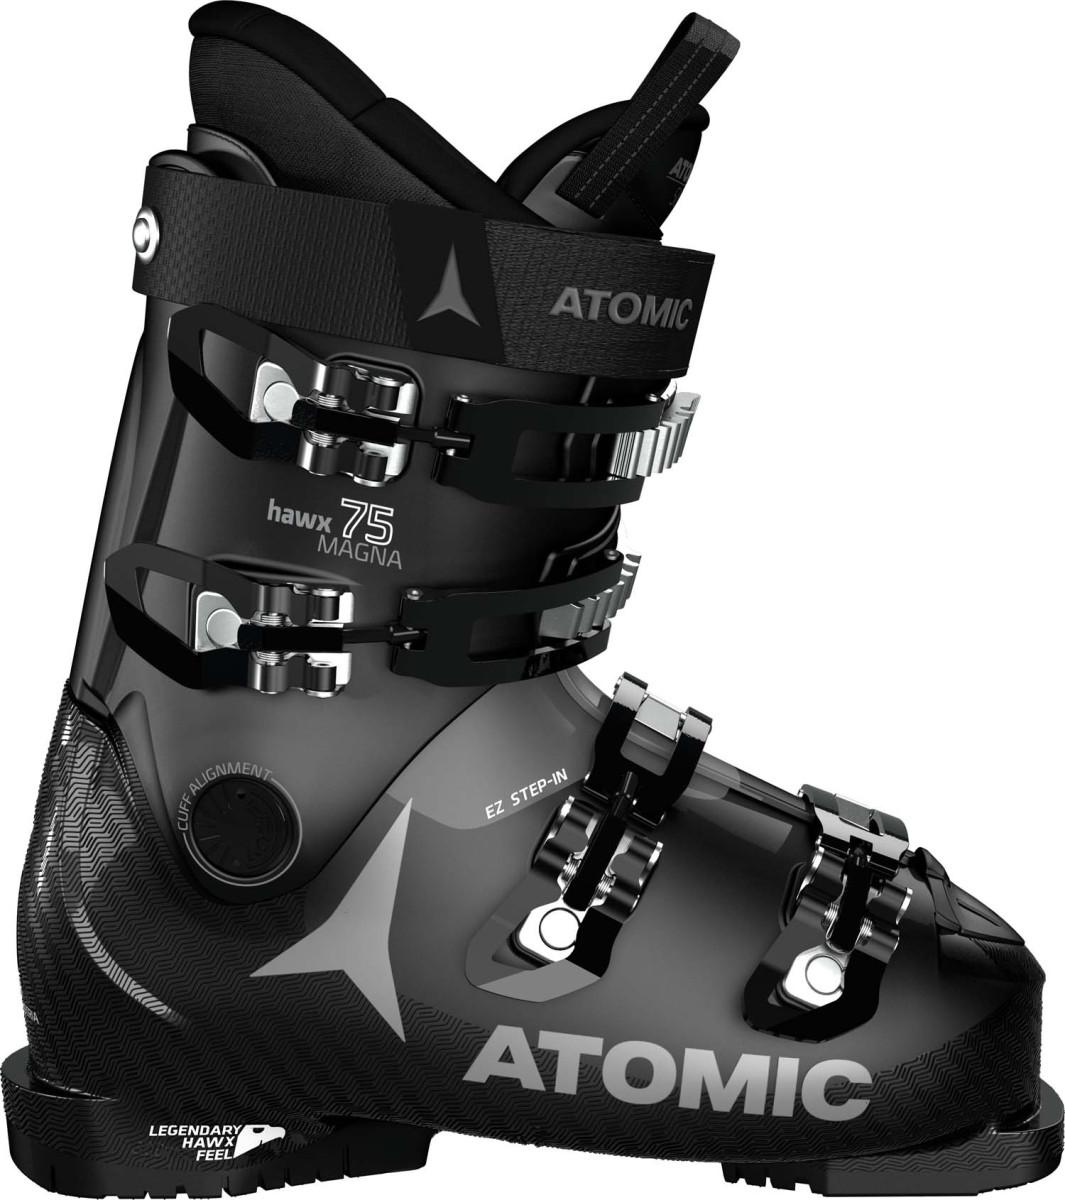 Atomic Hawx Magna 75 W 2020/2021